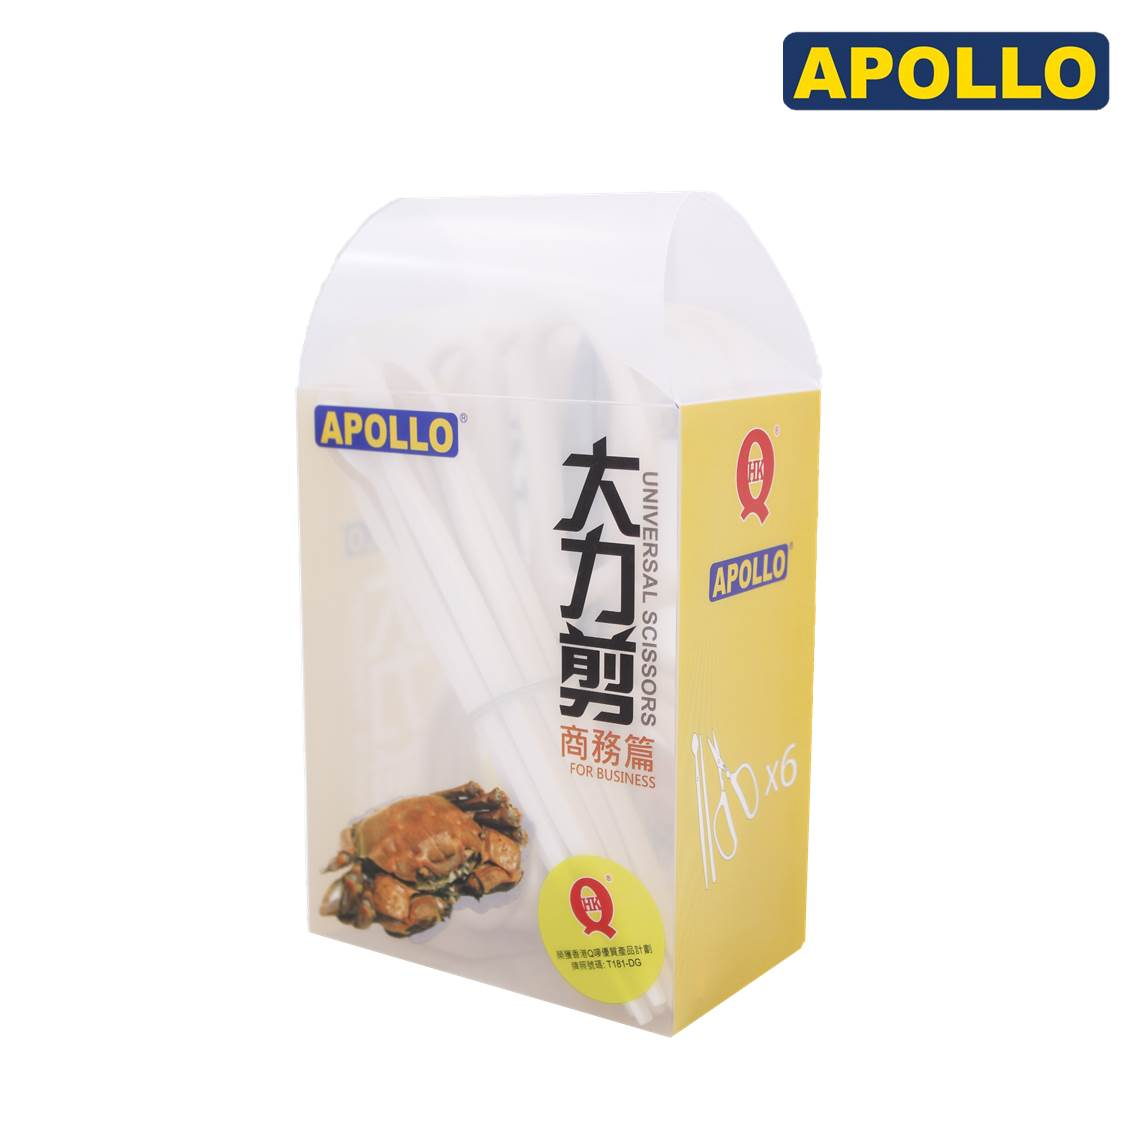 APOLLO大力剪(商務篇) 包括大力剪+蟹匙+蟹籤